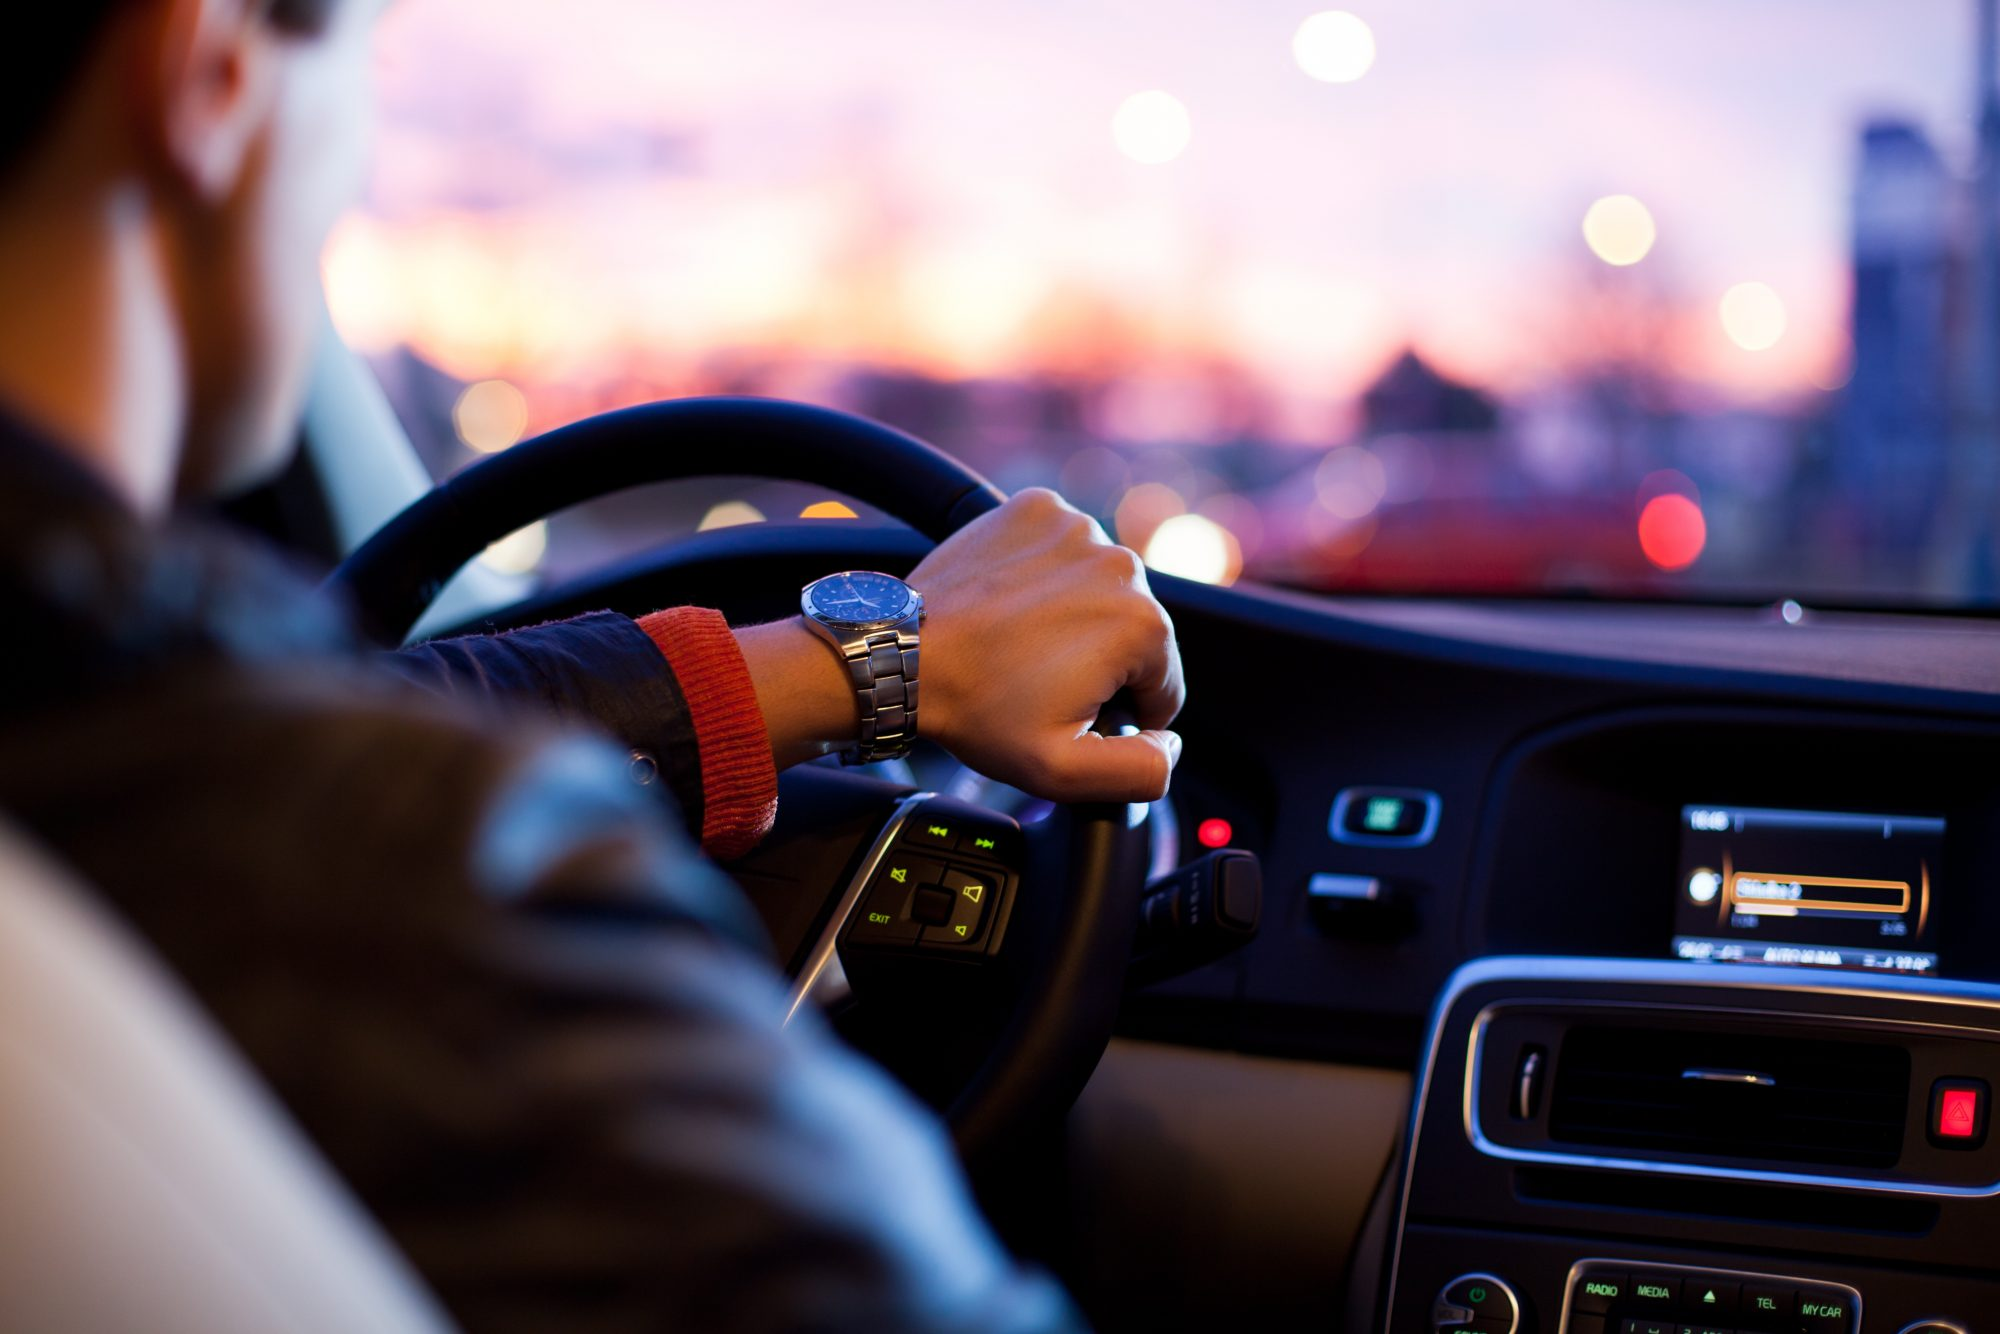 Ganti Toyota Baru Tiap 3 Tahun Tanpa Tunai? Bisa!